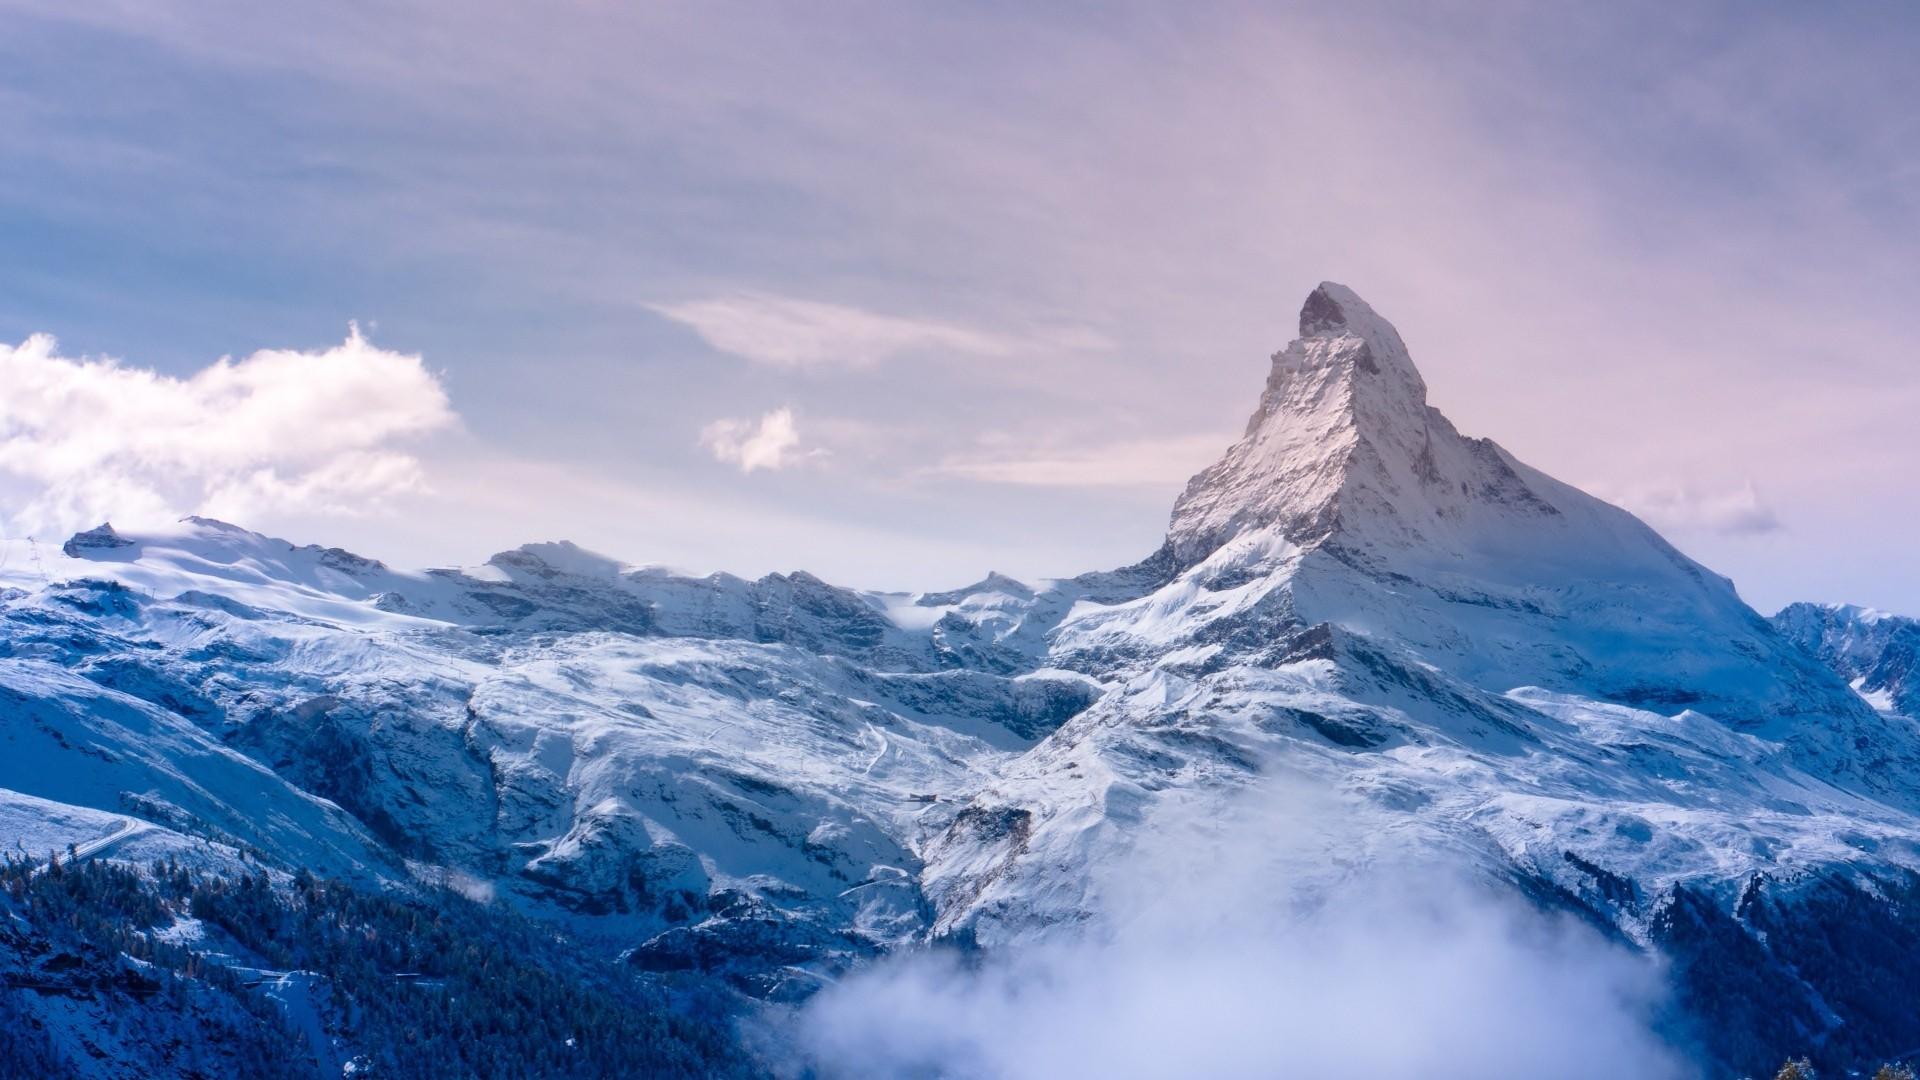 Snow Mountain Desktop wallpaper